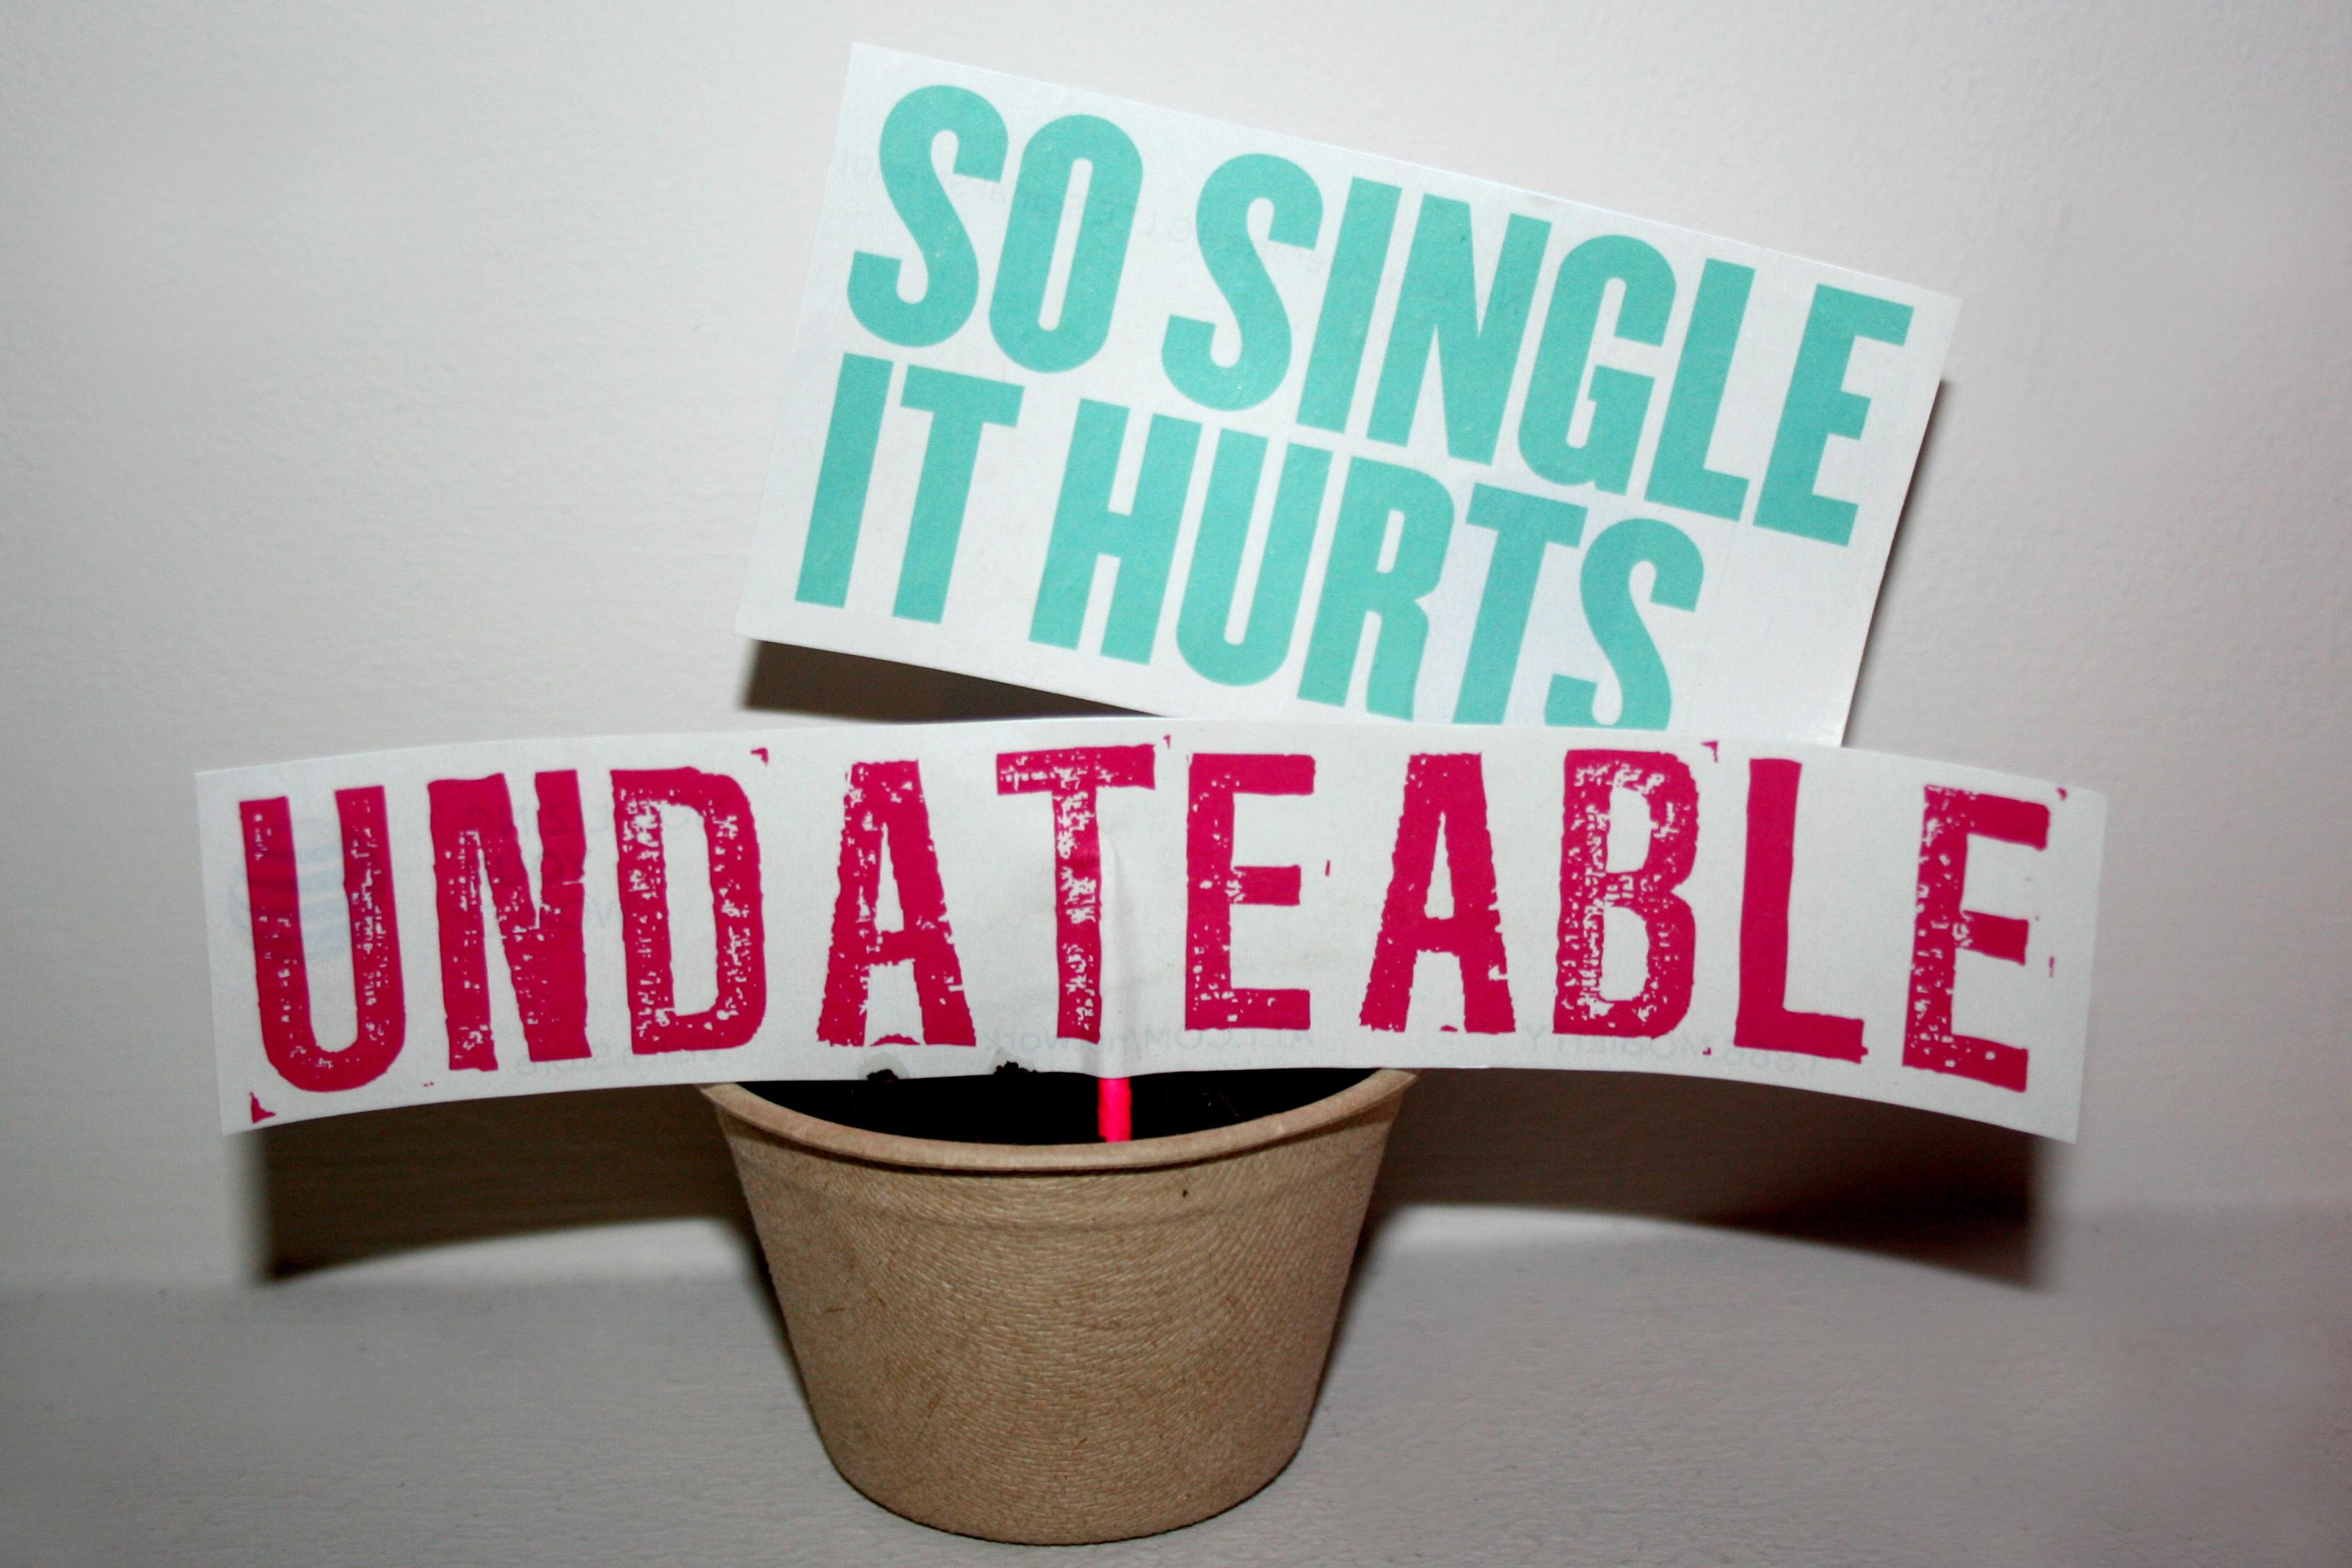 Dating sites am i undatable